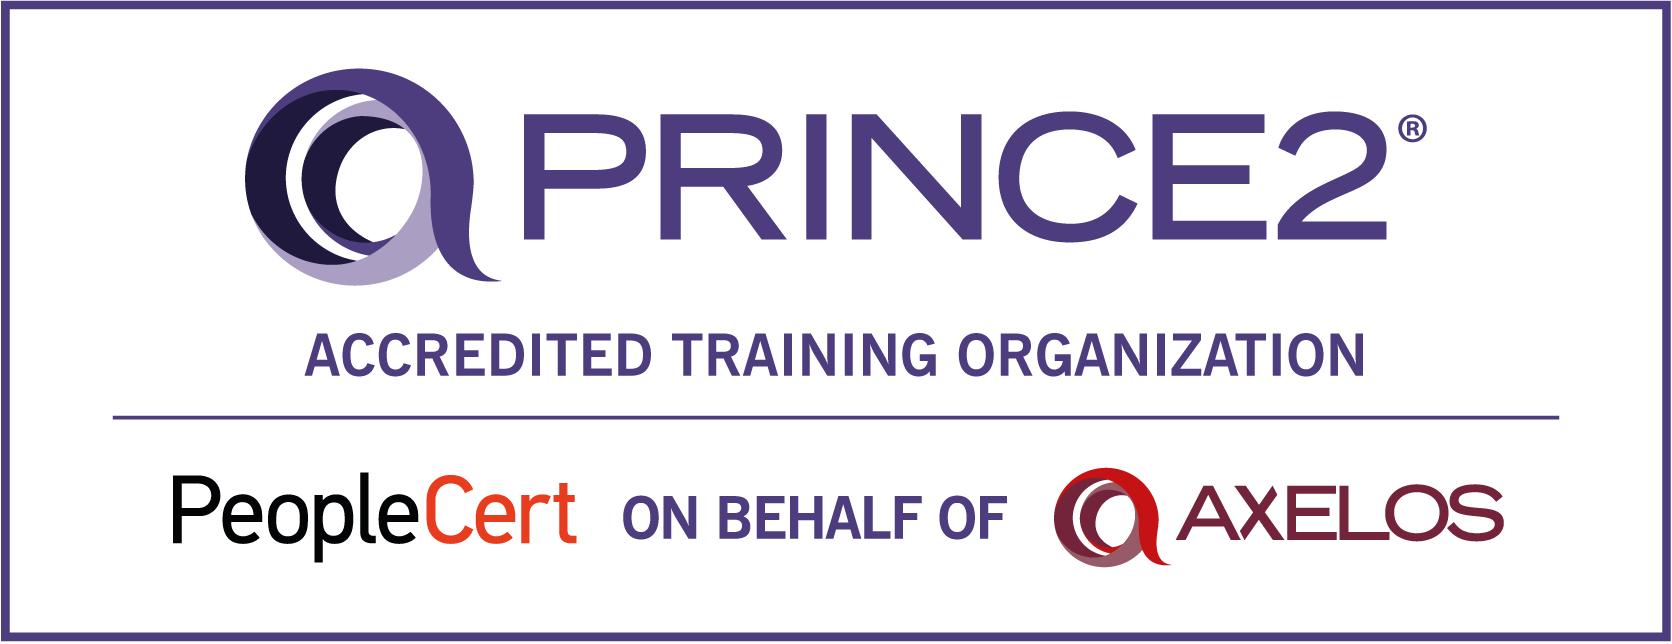 formation prince2 foundation prince2 foundation certification prince2 foundation